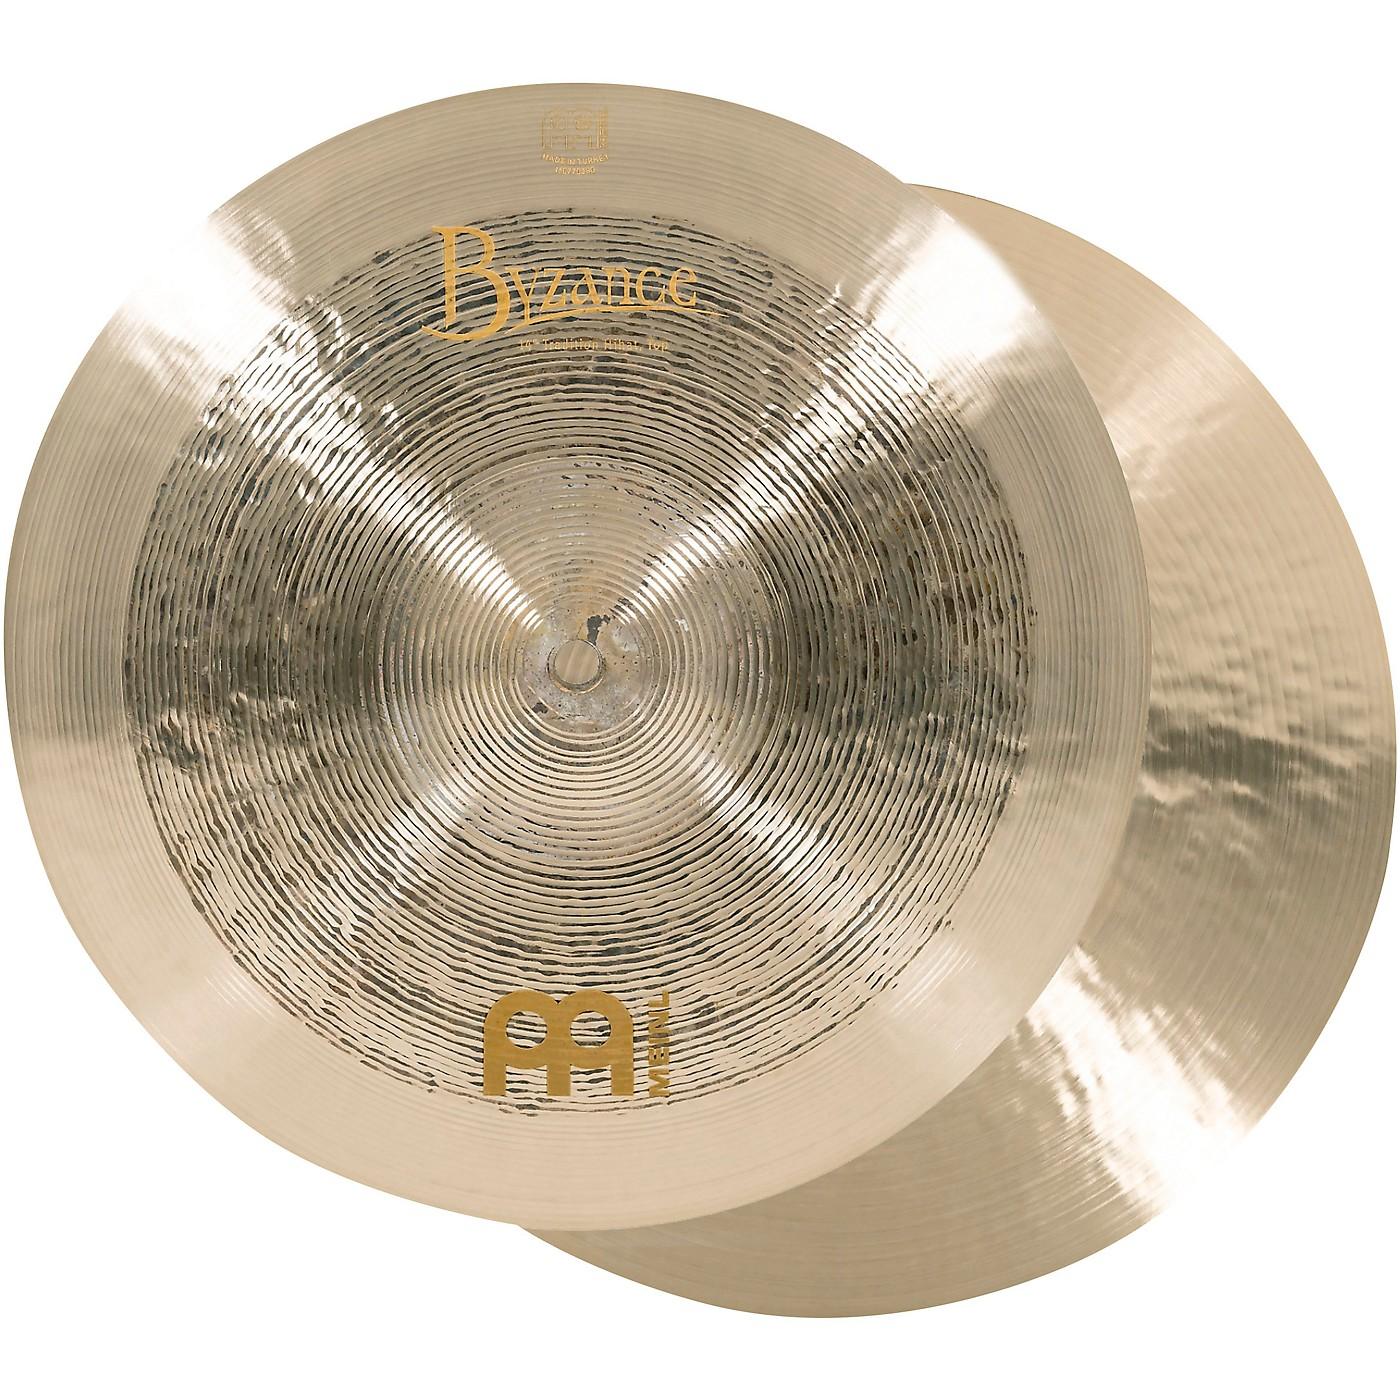 Meinl Byzance Jazz Tradition Hi-Hat Cymbal Pair thumbnail